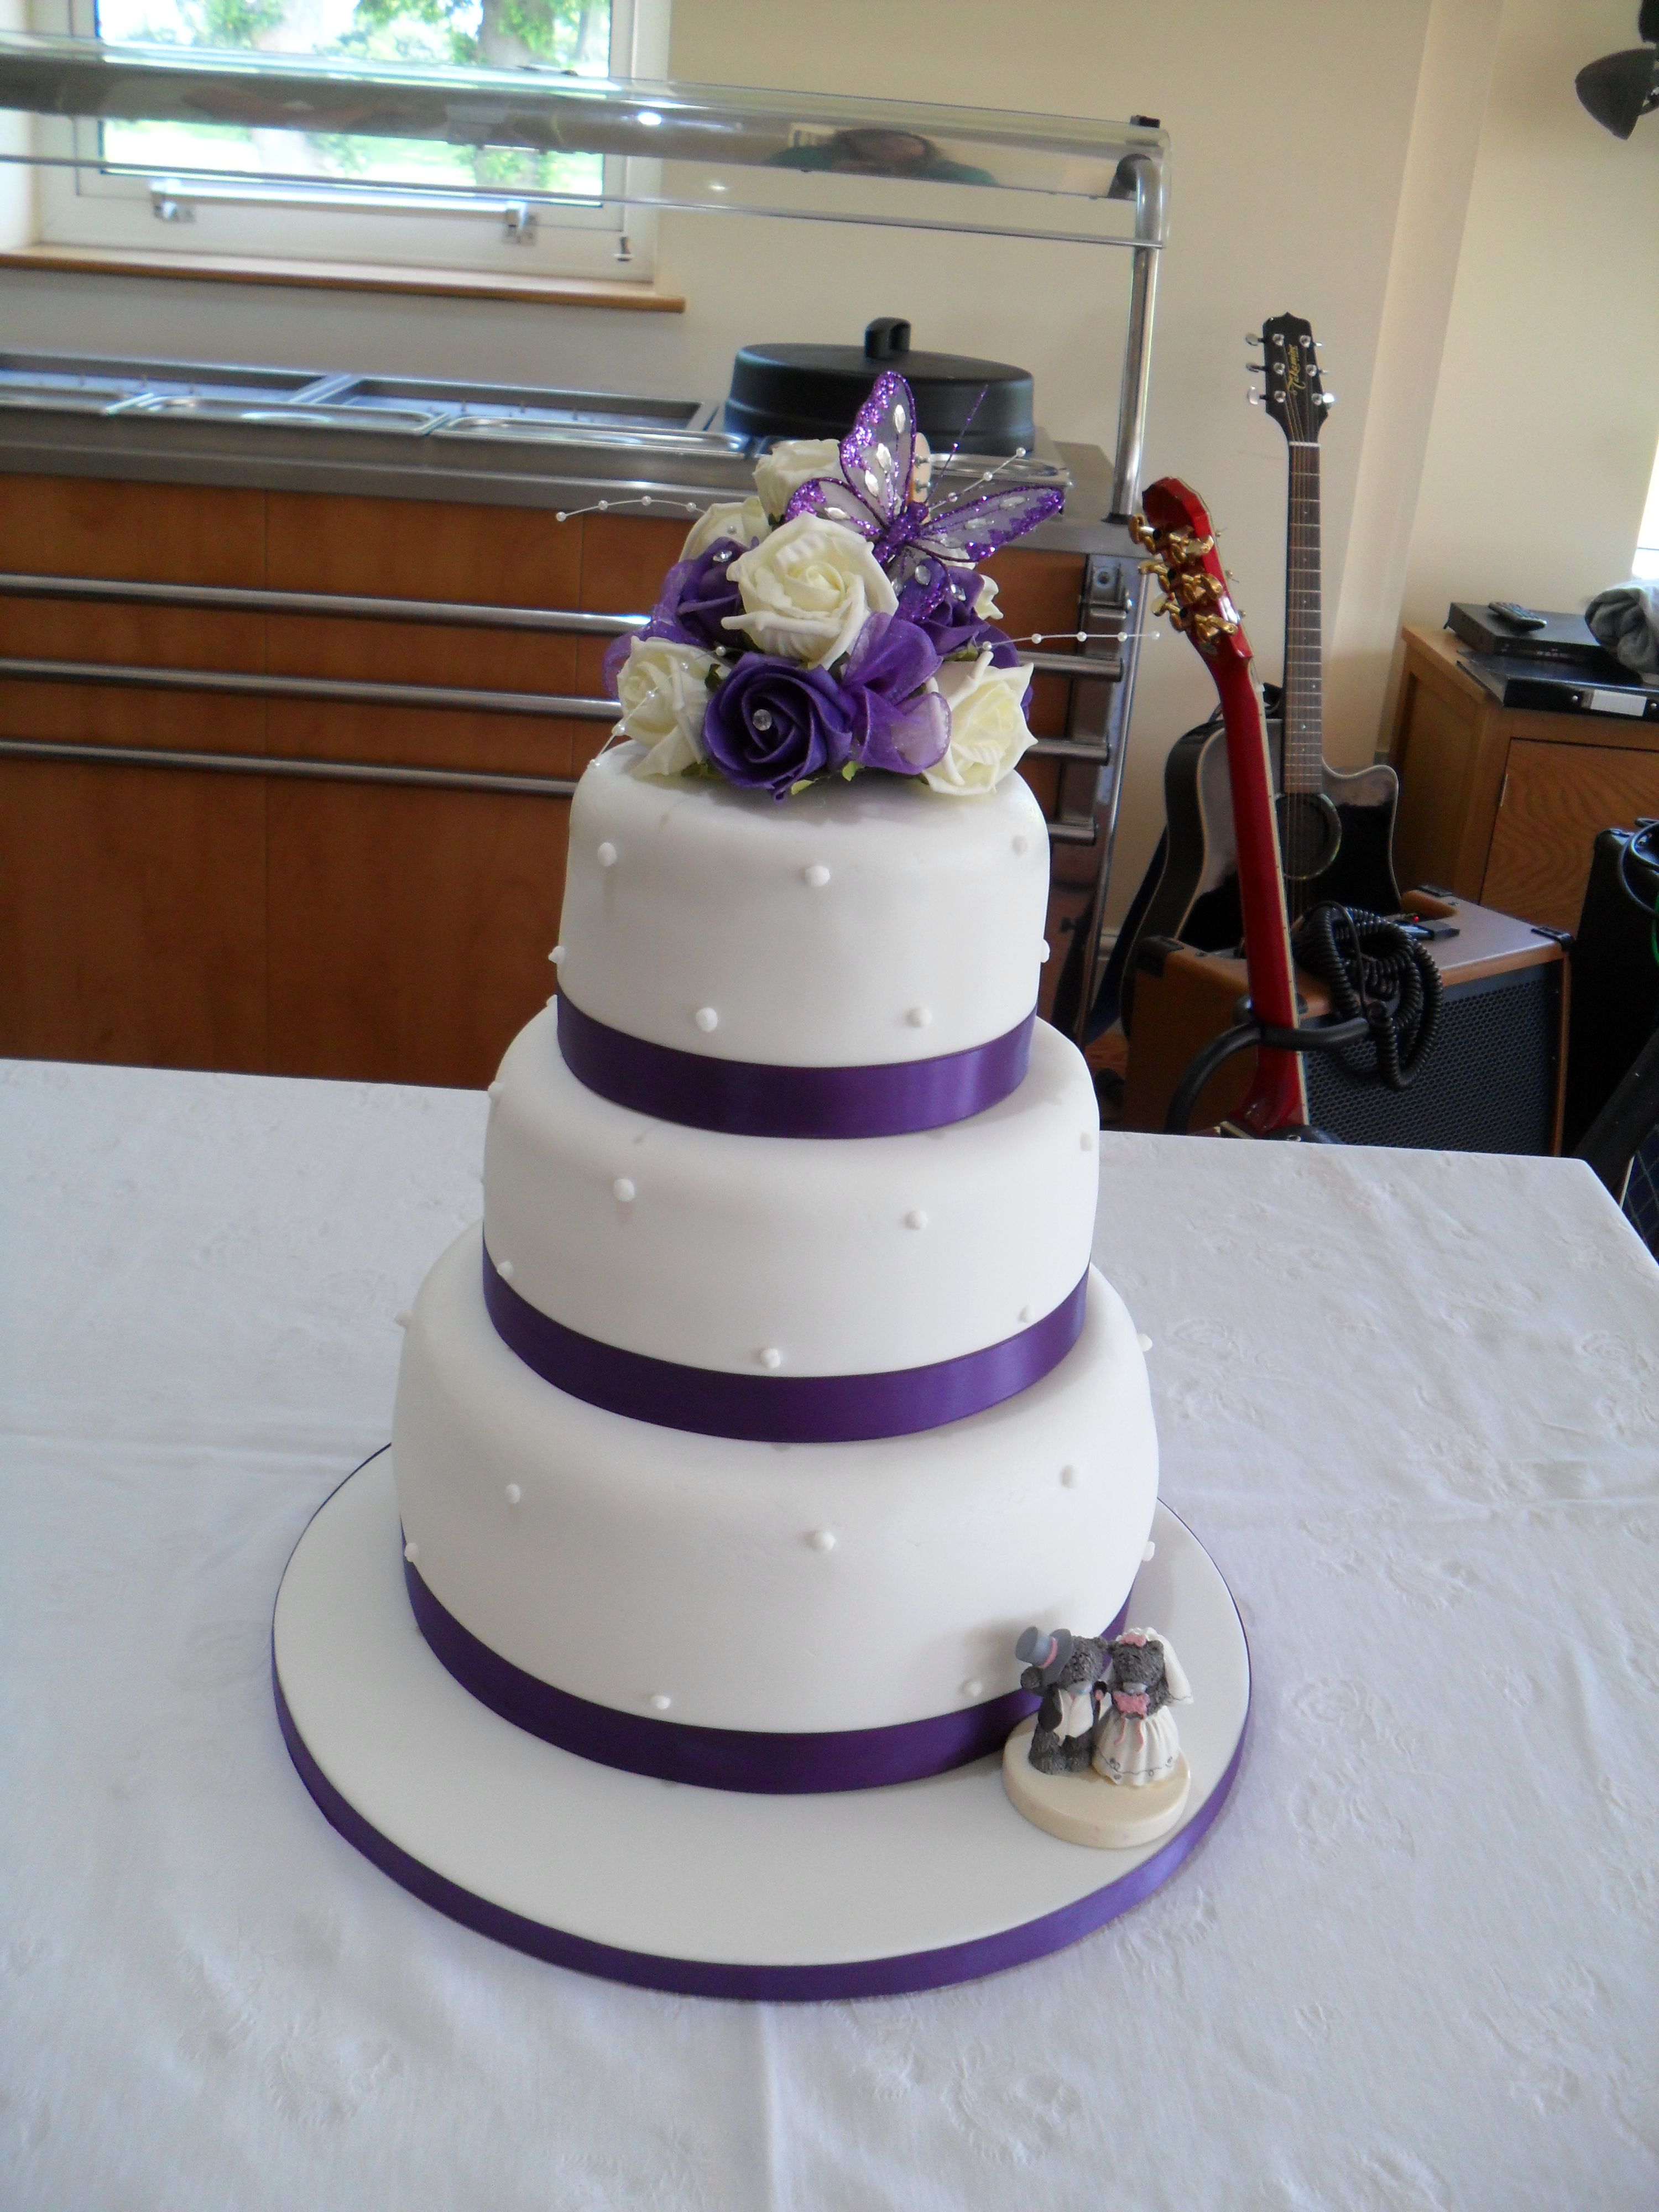 3 Tier Wedding Cake Purple Ribbons And Arrangement 3 Tier